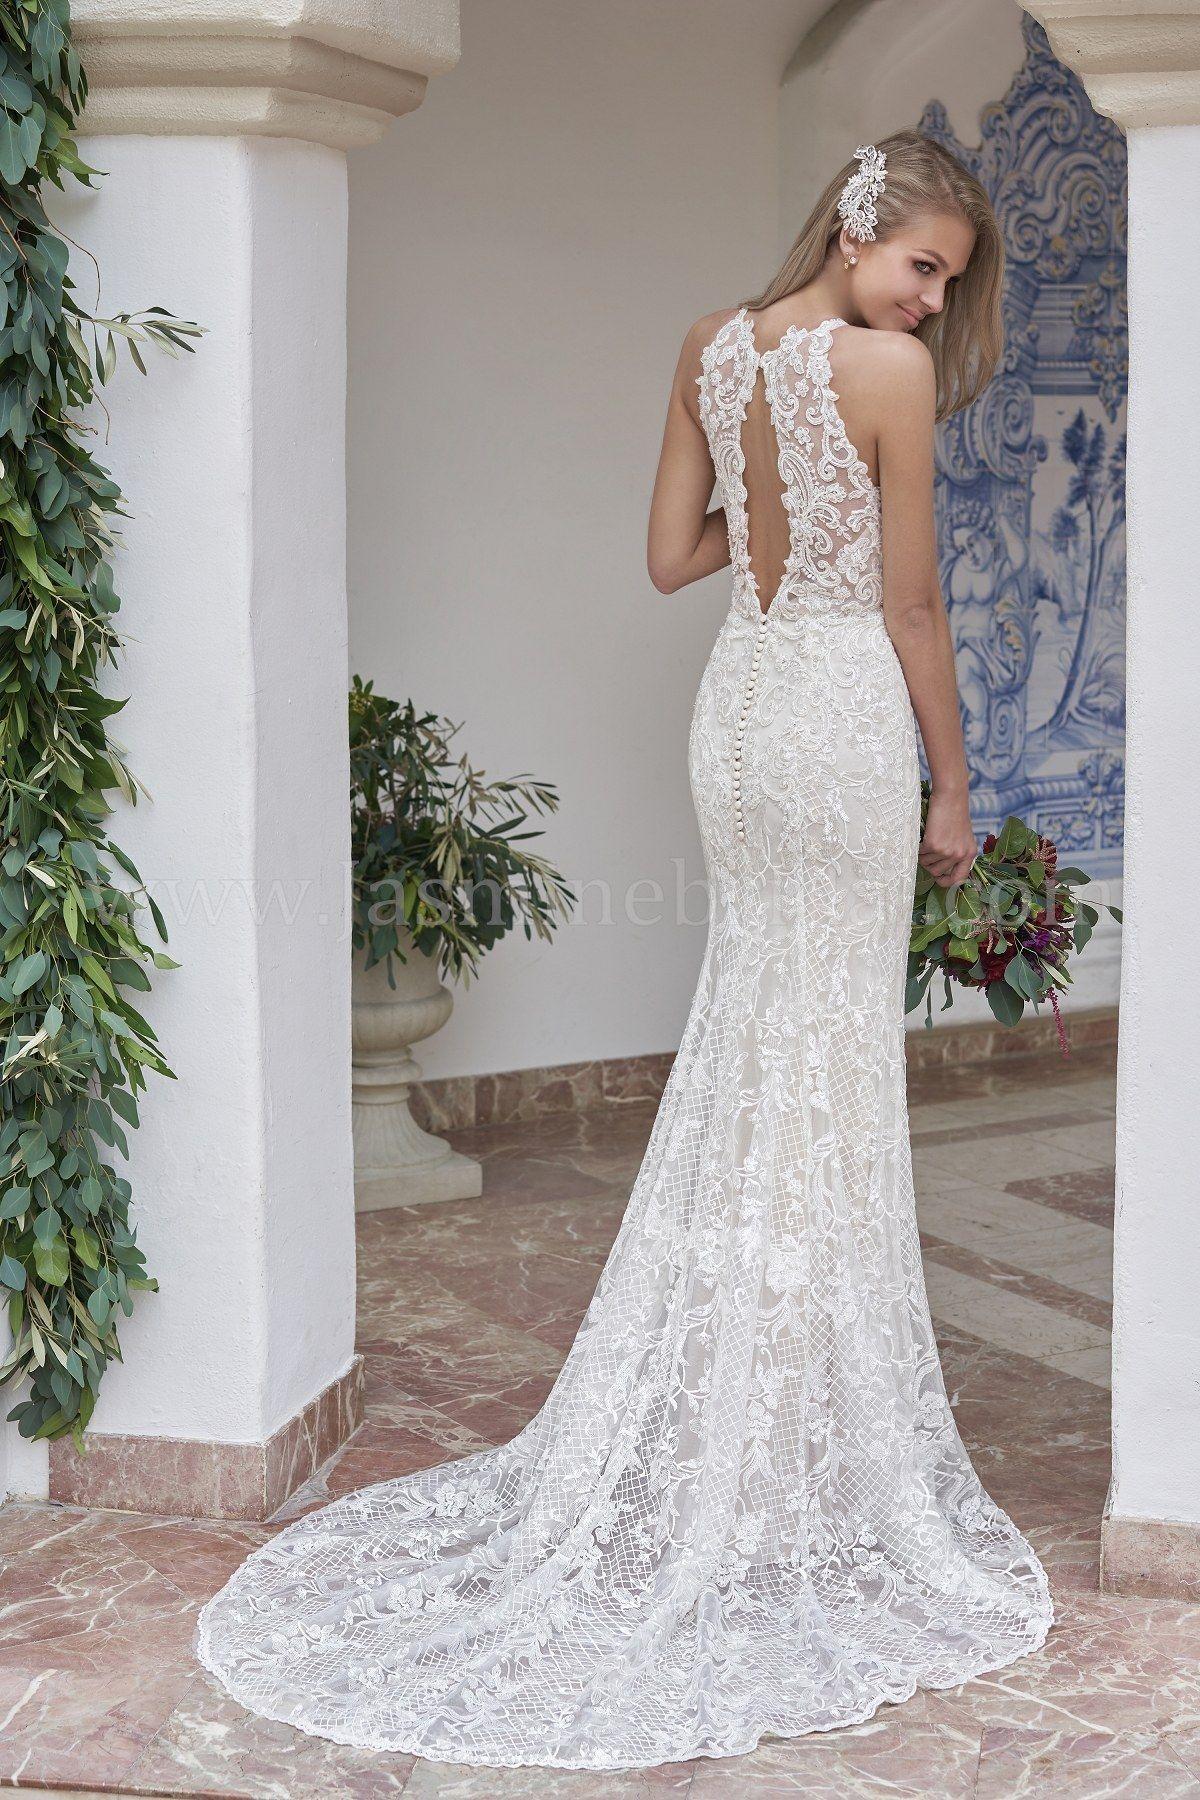 Jasmine Bridal Wedding Dress Beautiful Wedding Dress Pretty Wedding Dresses Lace Wedding Dress Wedding Dresses Wedding Dresses Lace Outdoor Wedding Dress